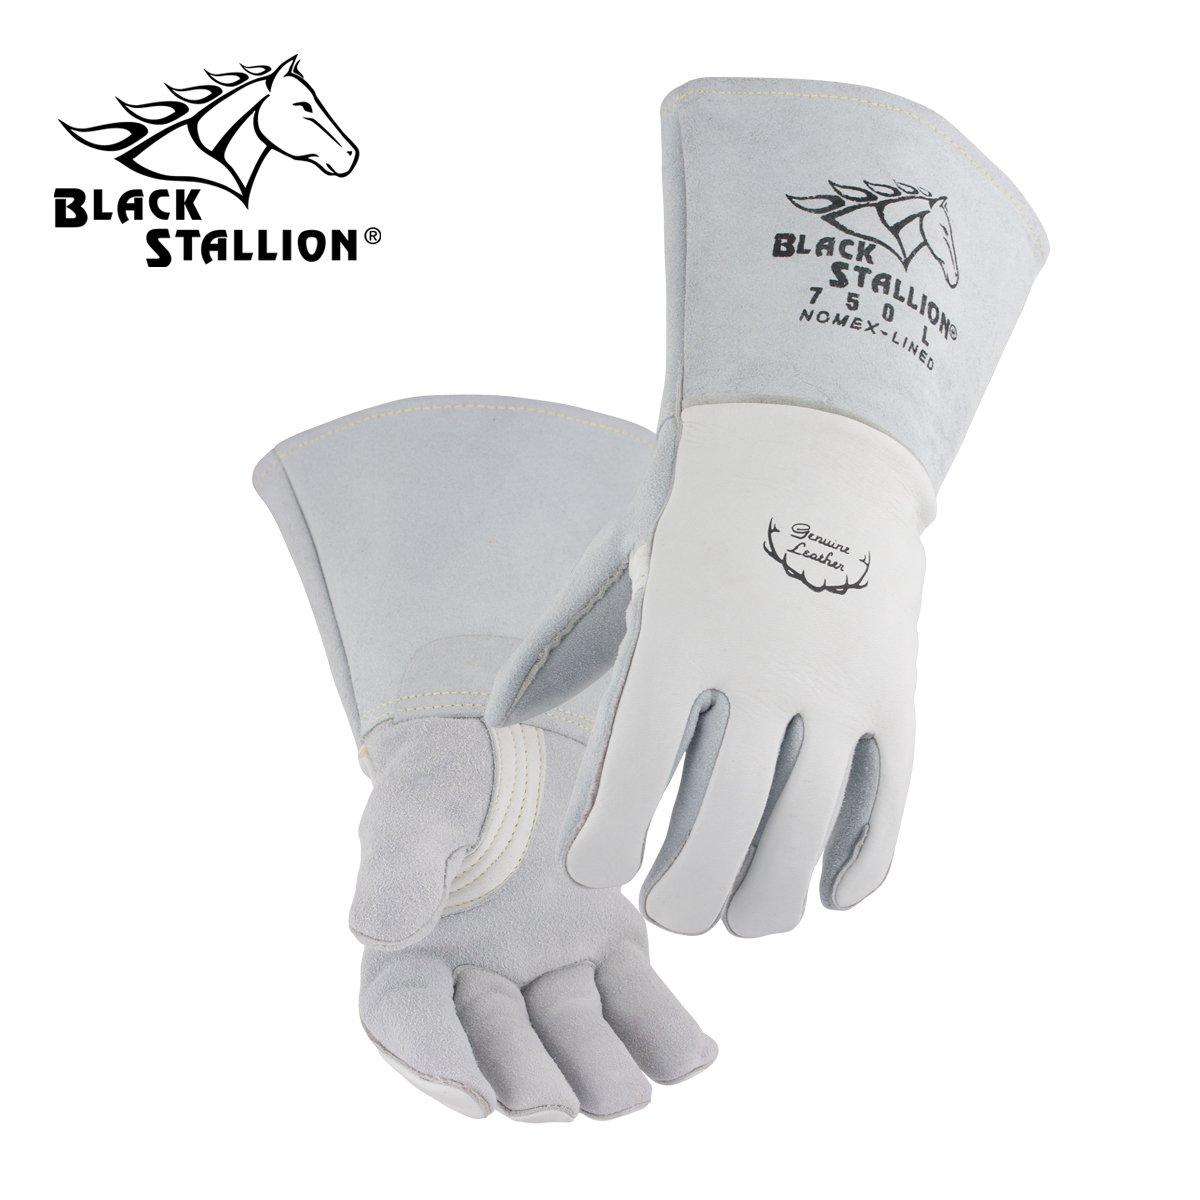 Revco 750-S Black Stallion Welding Glove, Premium Grain Elk Skin, Small  (12 Pairs)